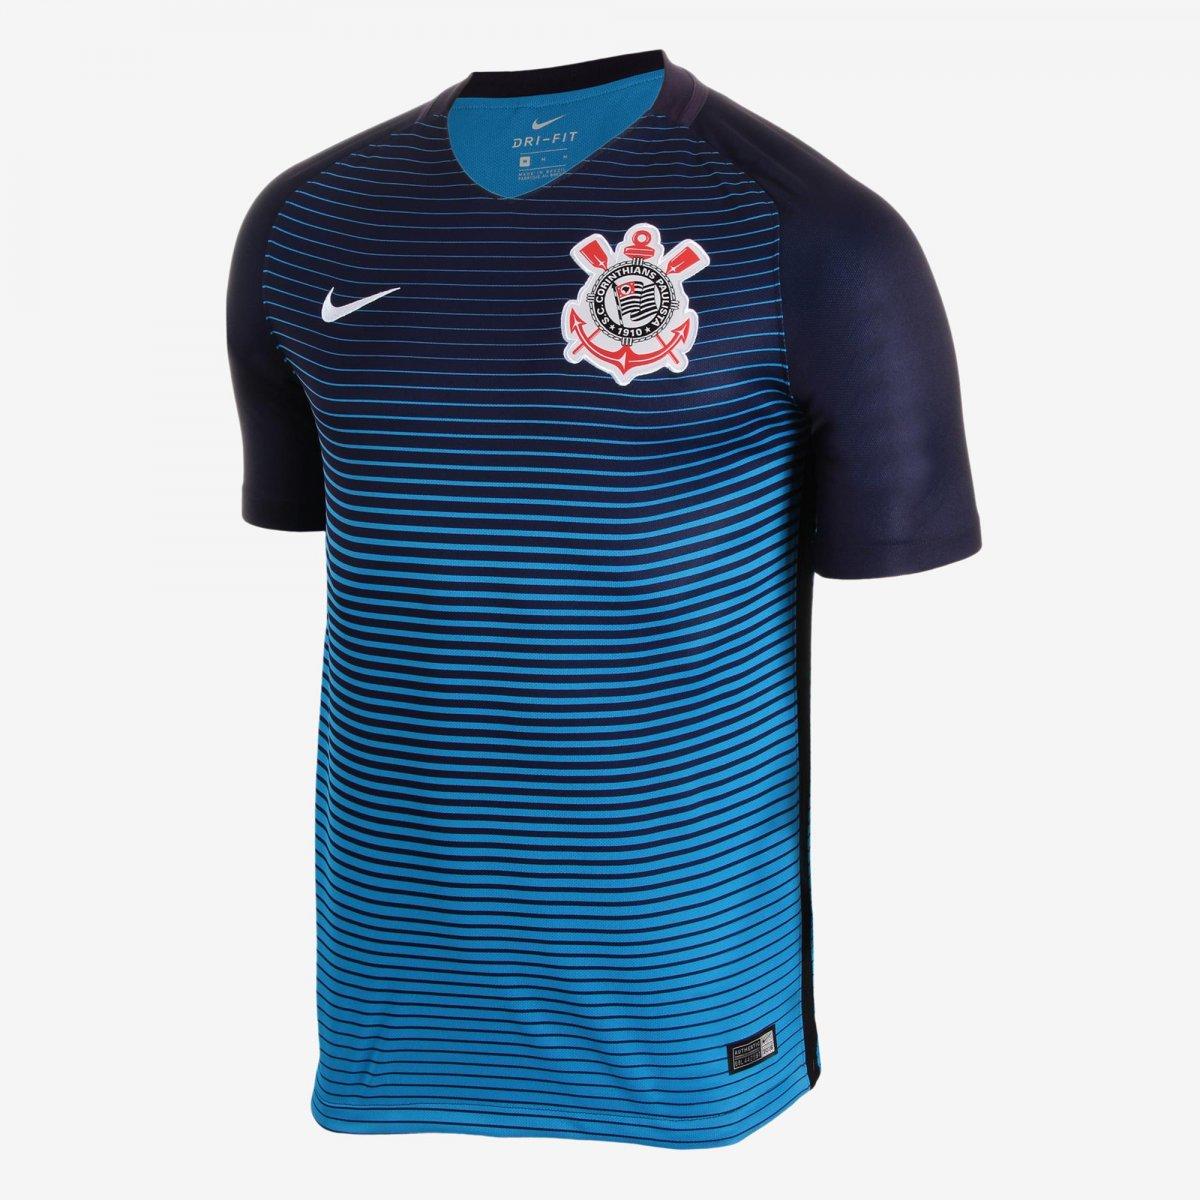 Camisa Masculina Nike S.C Corinthians III 2016 17 Torcedor 776977-560  Marinho 63b13b8177b63